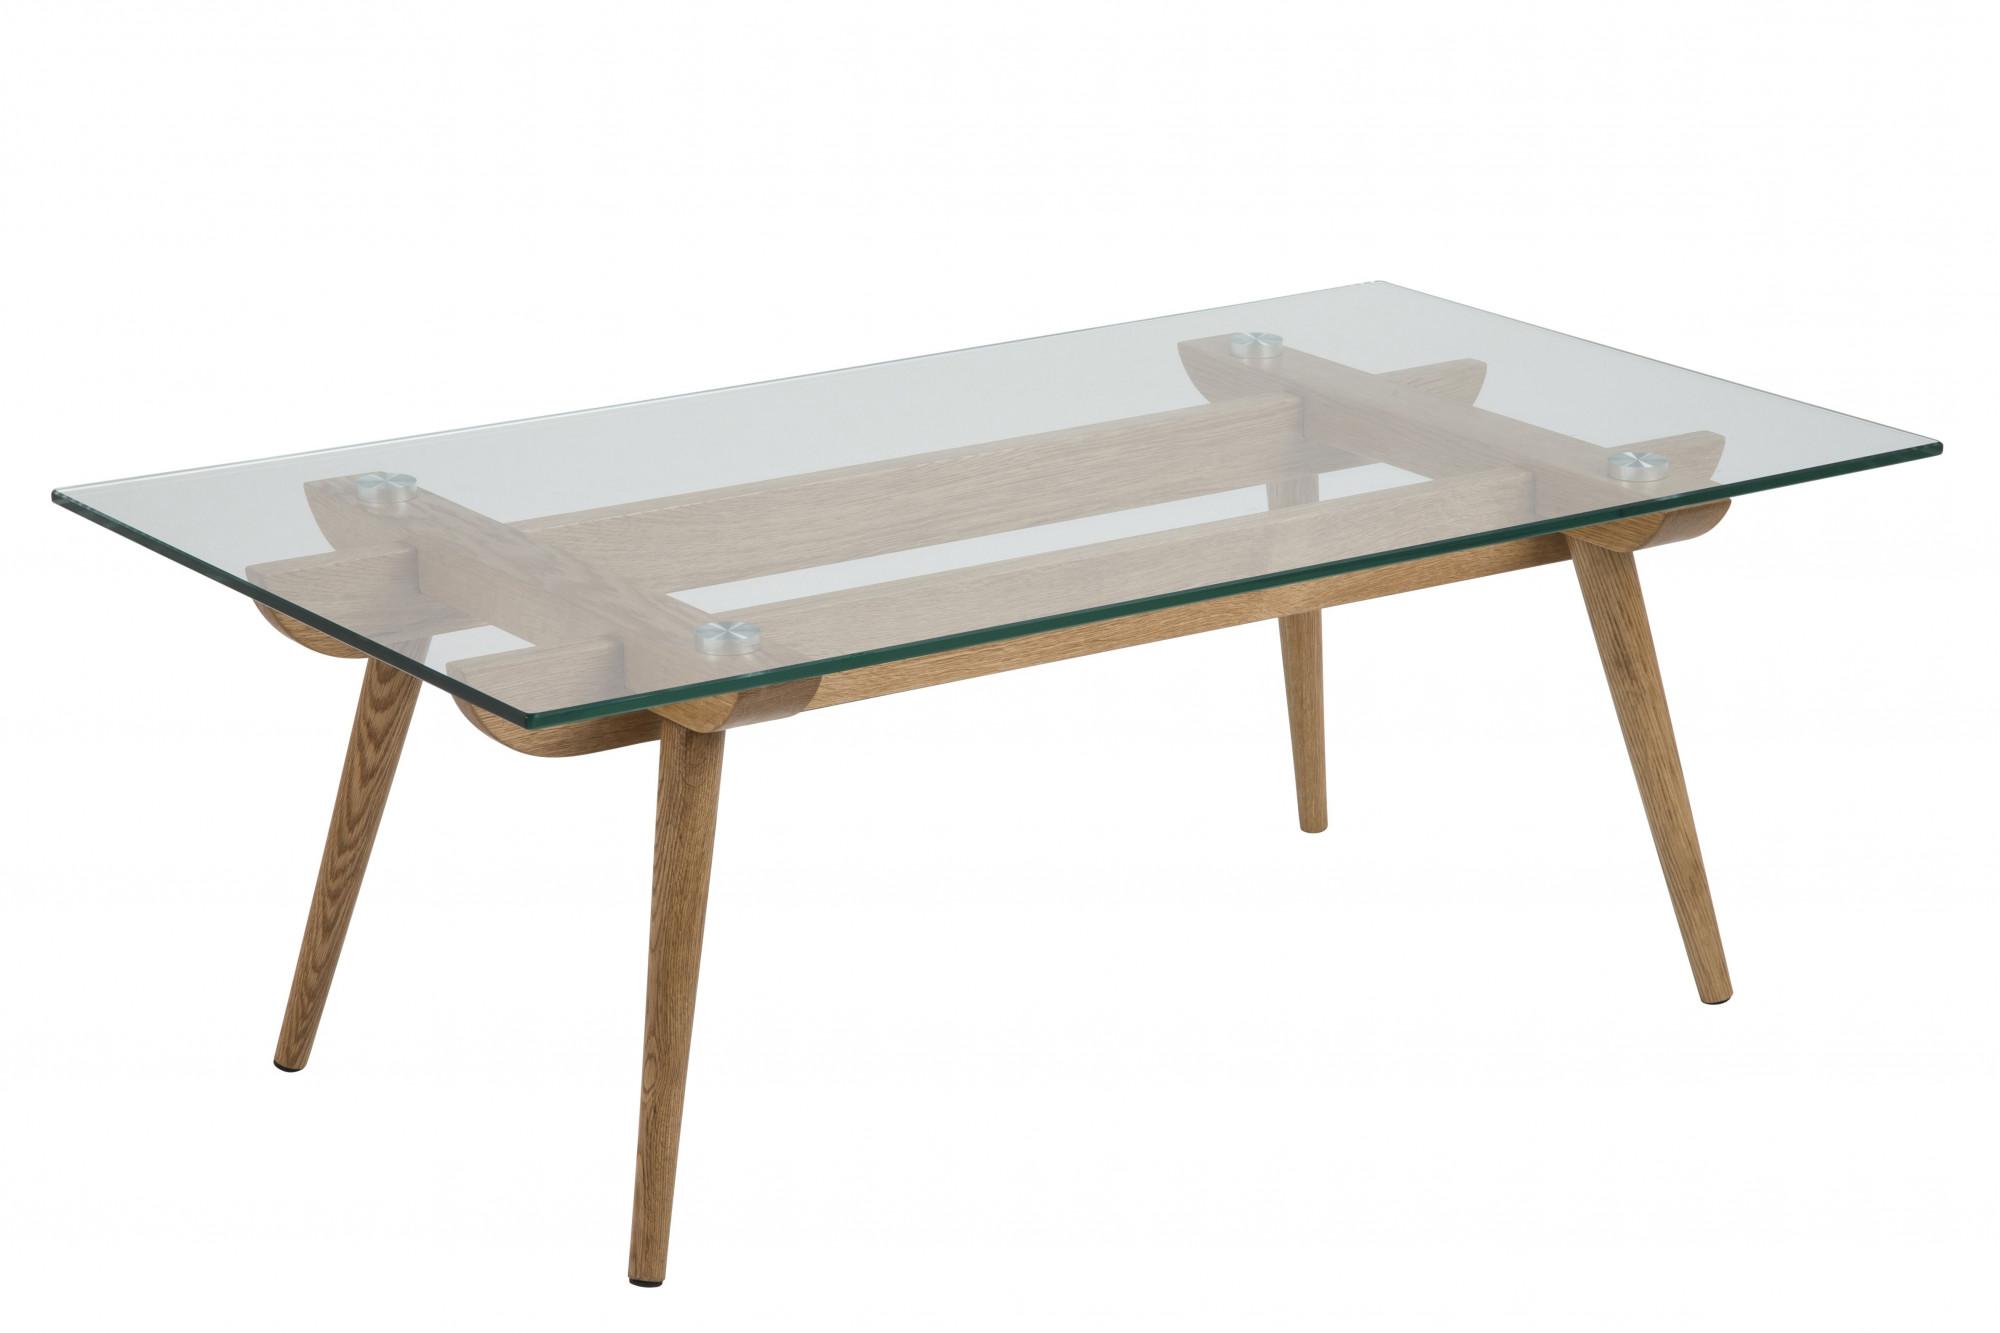 table basse de salon en bois massif et plateau verre hellin. Black Bedroom Furniture Sets. Home Design Ideas